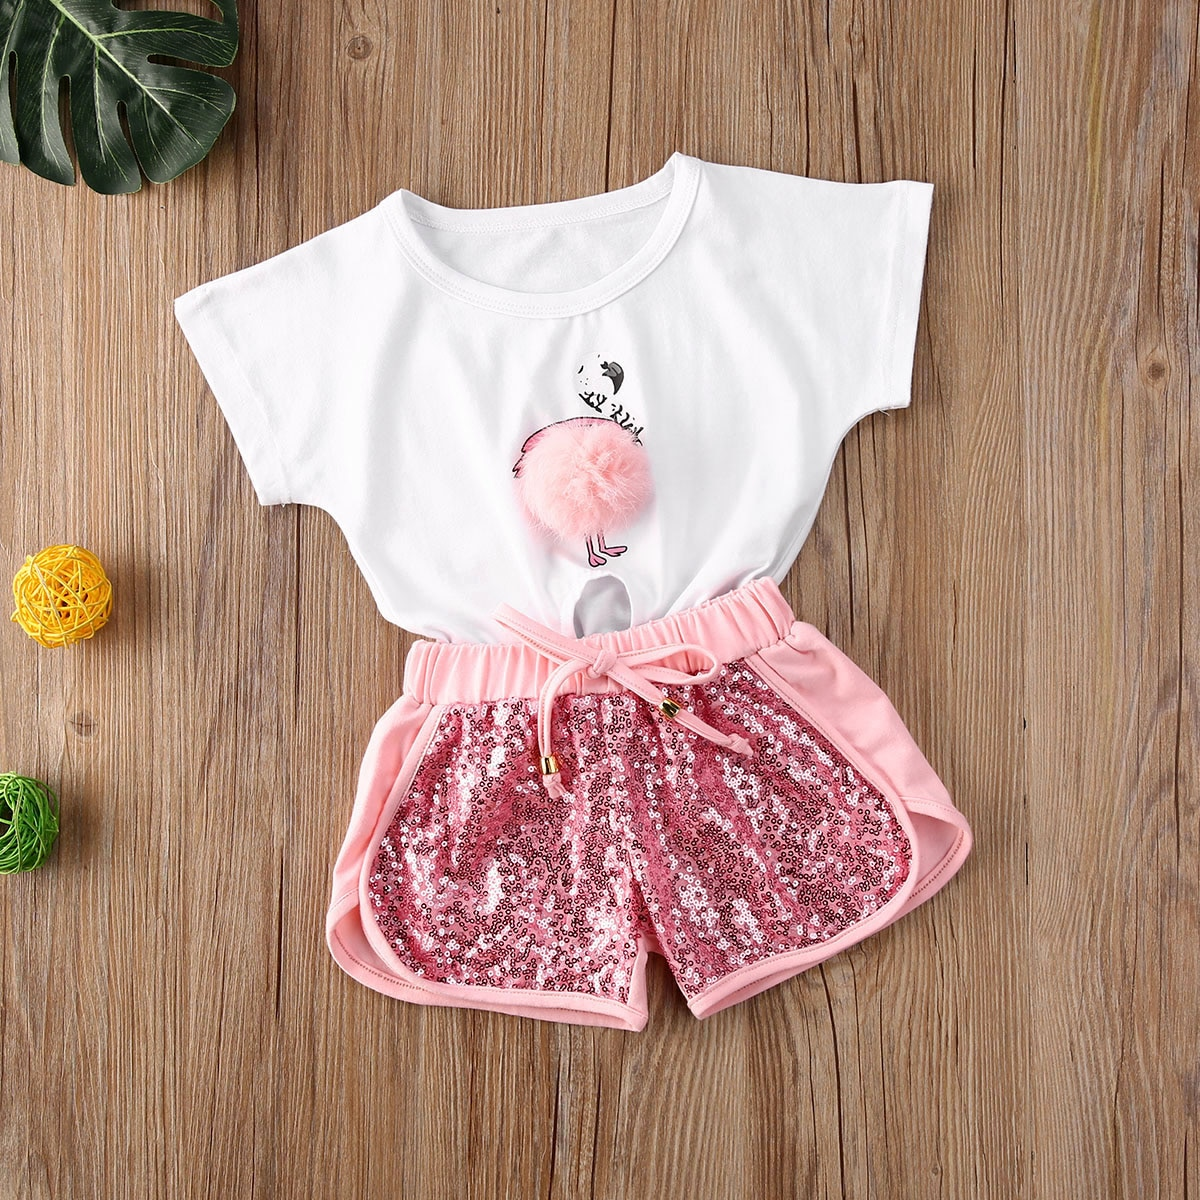 Verano 2020 niñas traje transpirable Casual flamenco patrón de felpa Bola de manga corta Top camisa lentejuelas ropa pantalones conjunto